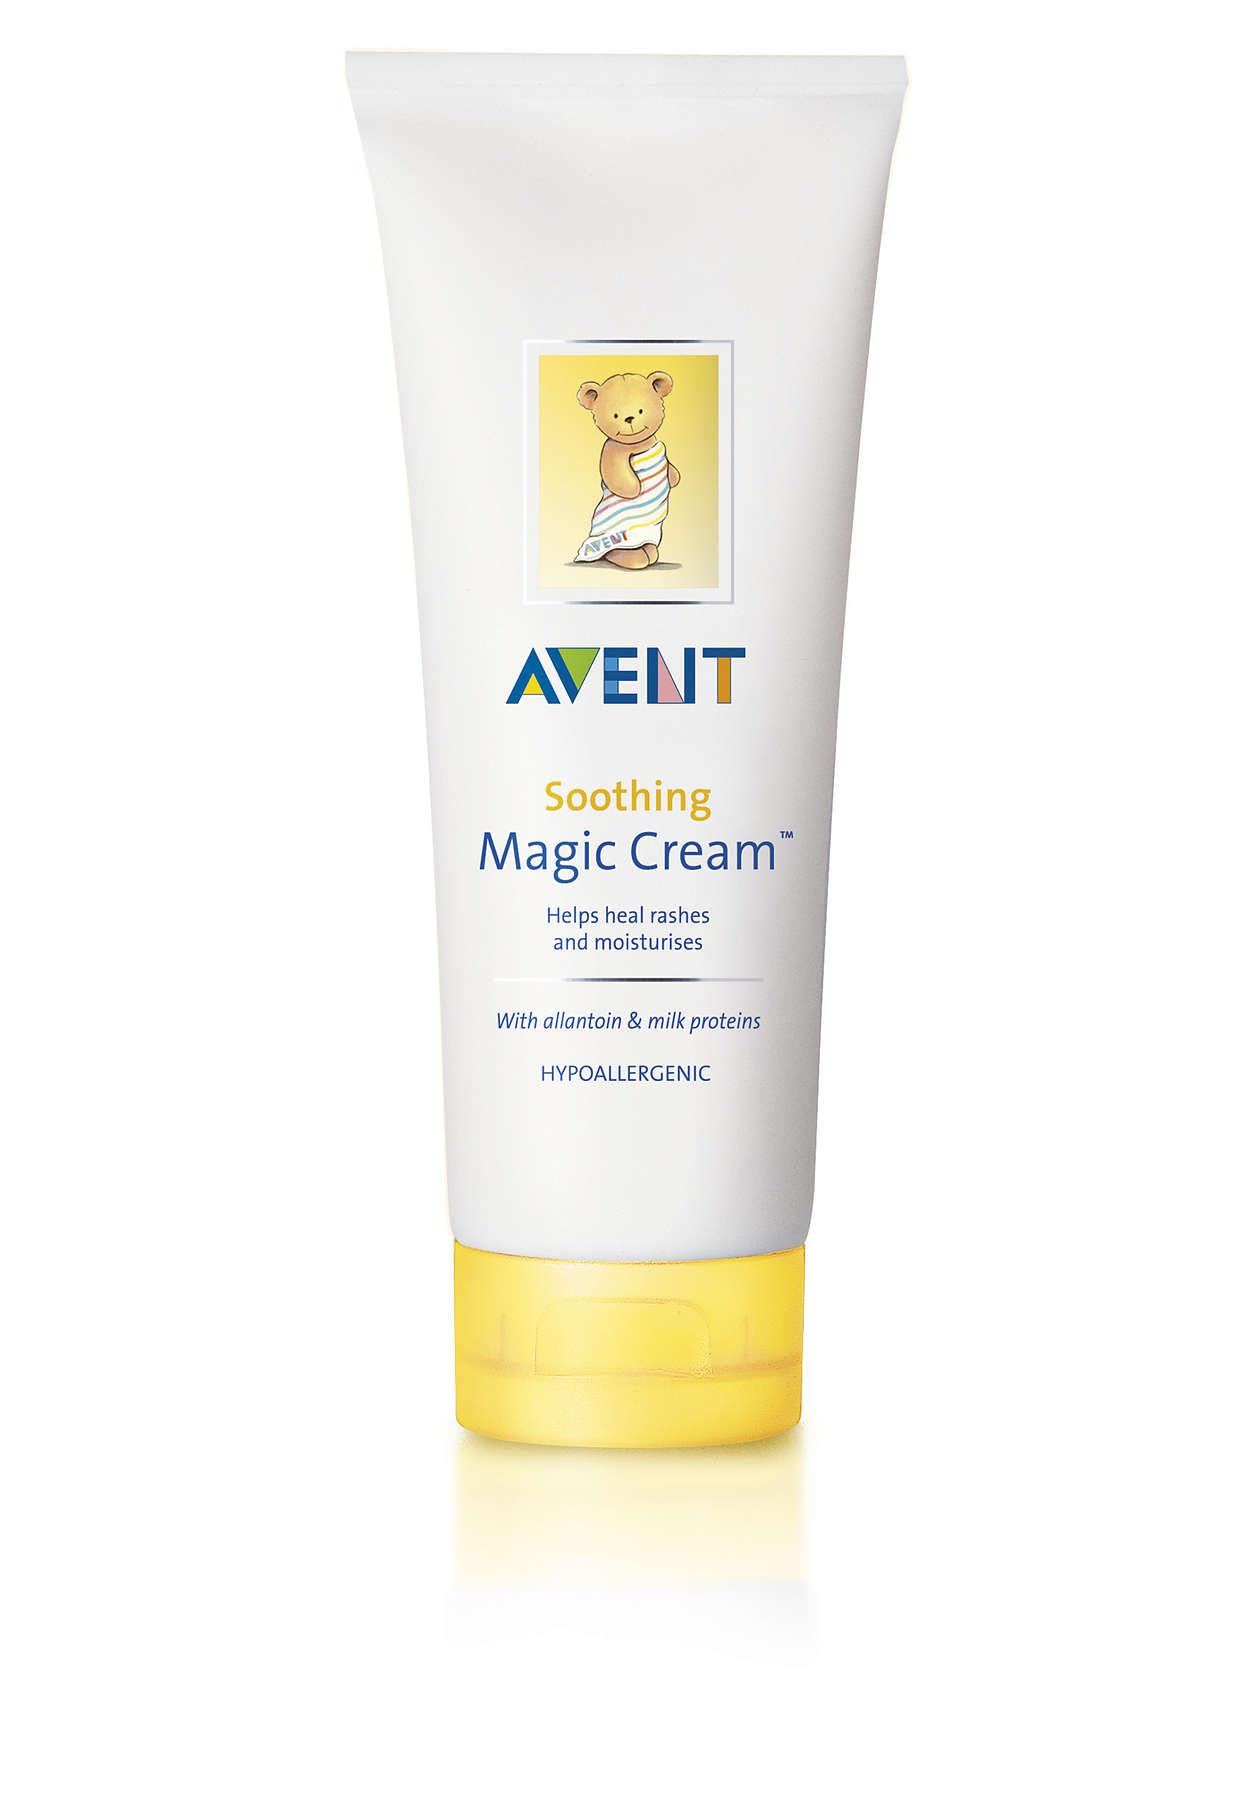 Helps heal rashes and moisturises